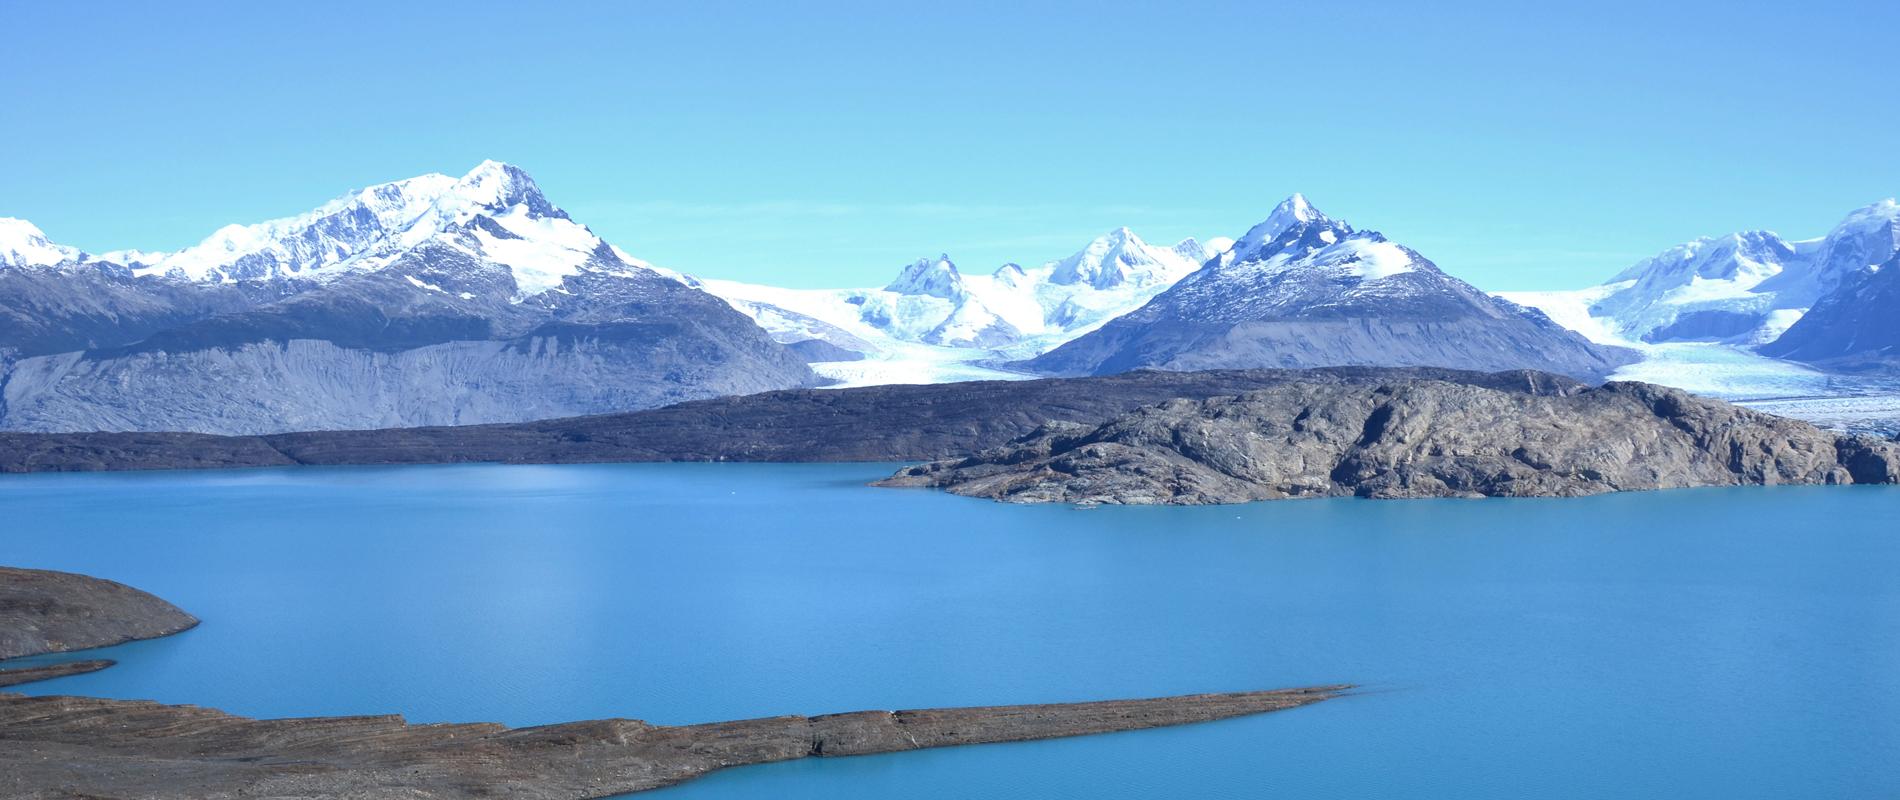 Argentine | Lac Argentino